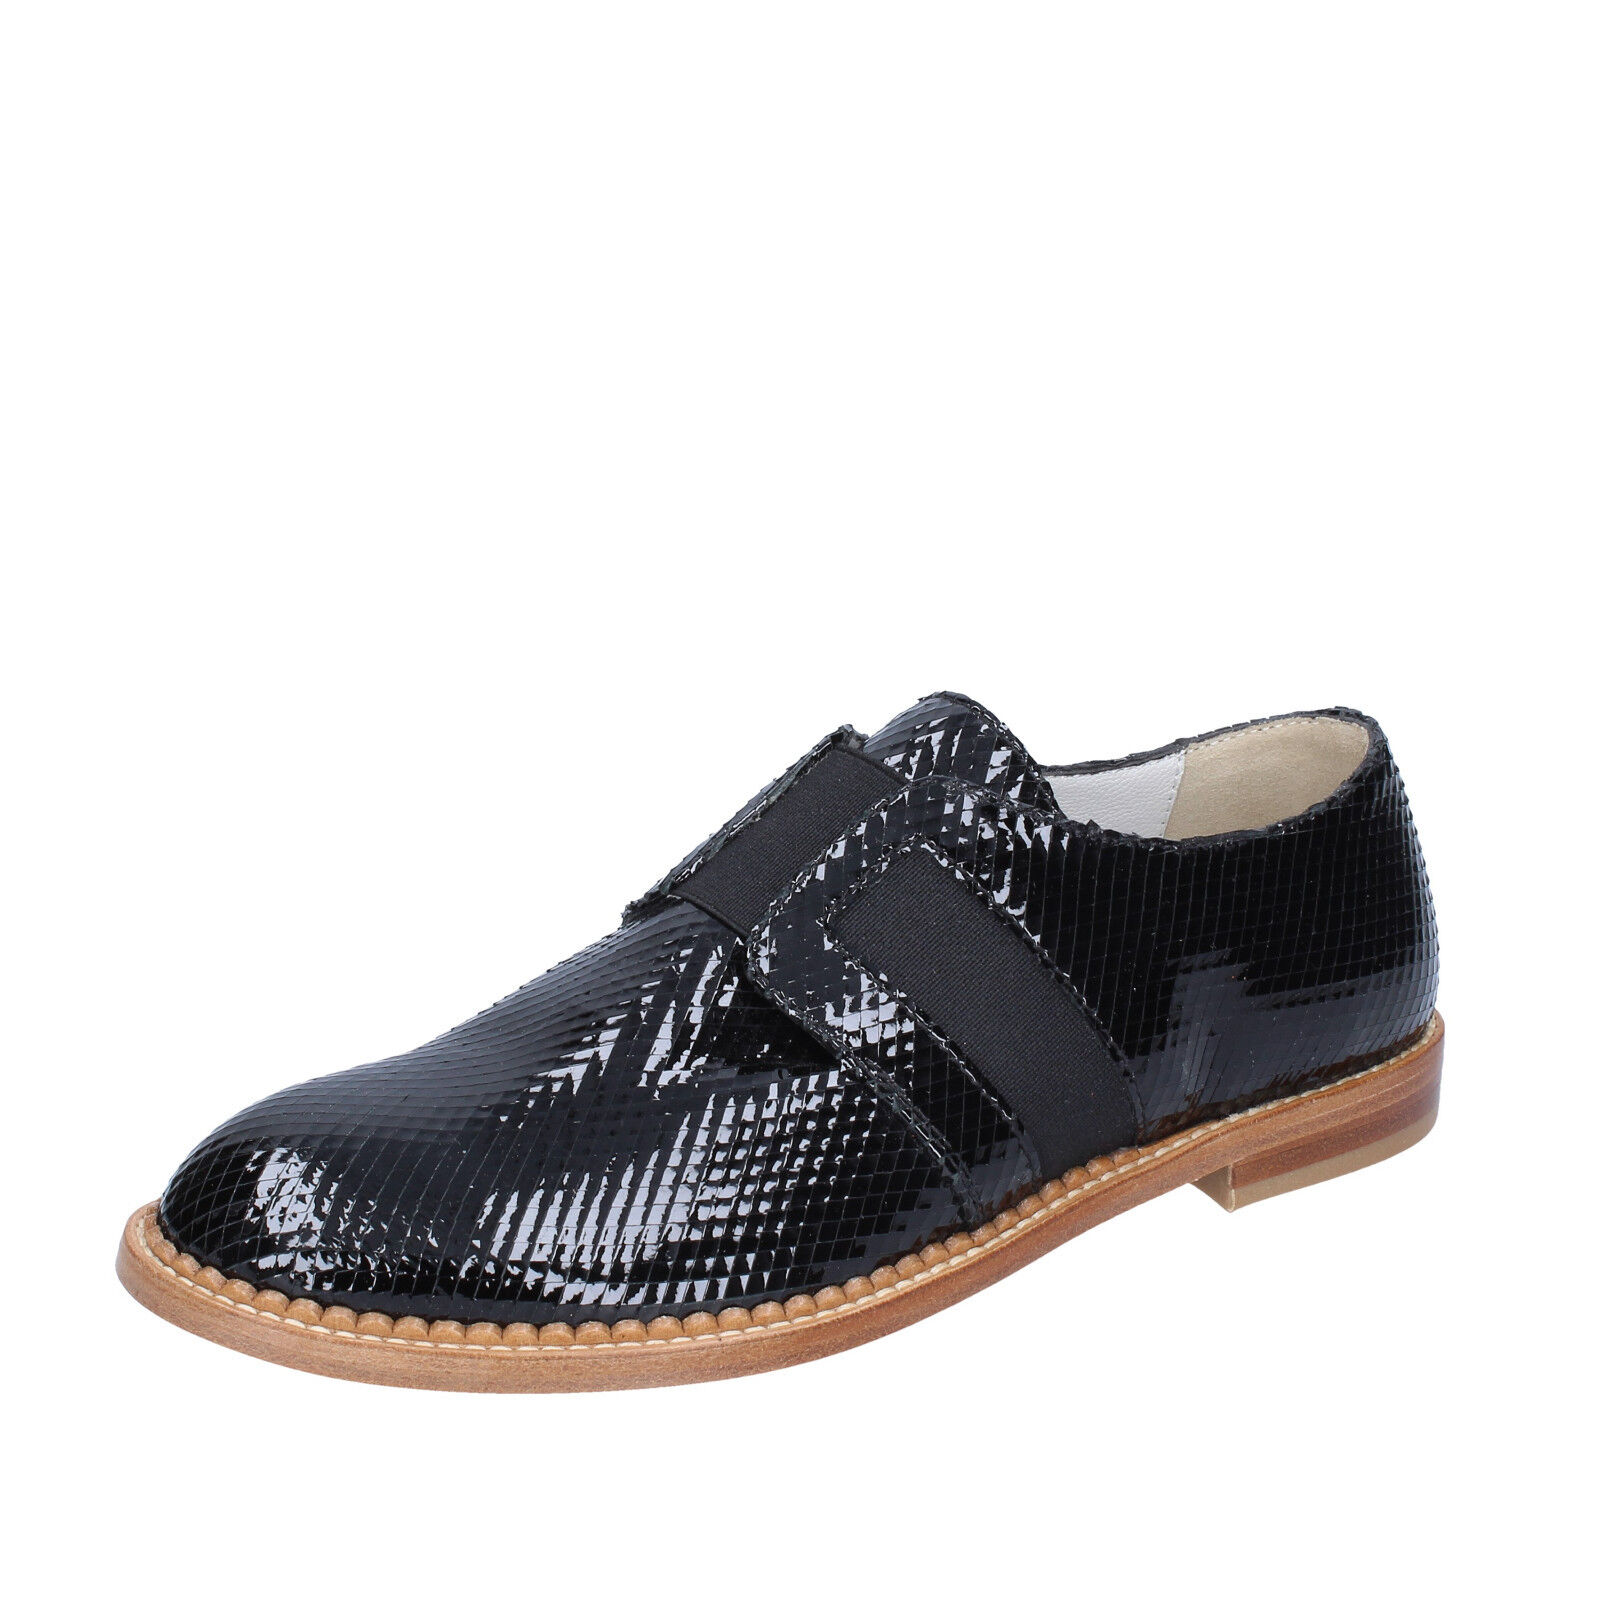 Donna  Scarpe Arnold churgin 3,5 EU 36,5 elegante nera pelle verniciata BT955-36, 5